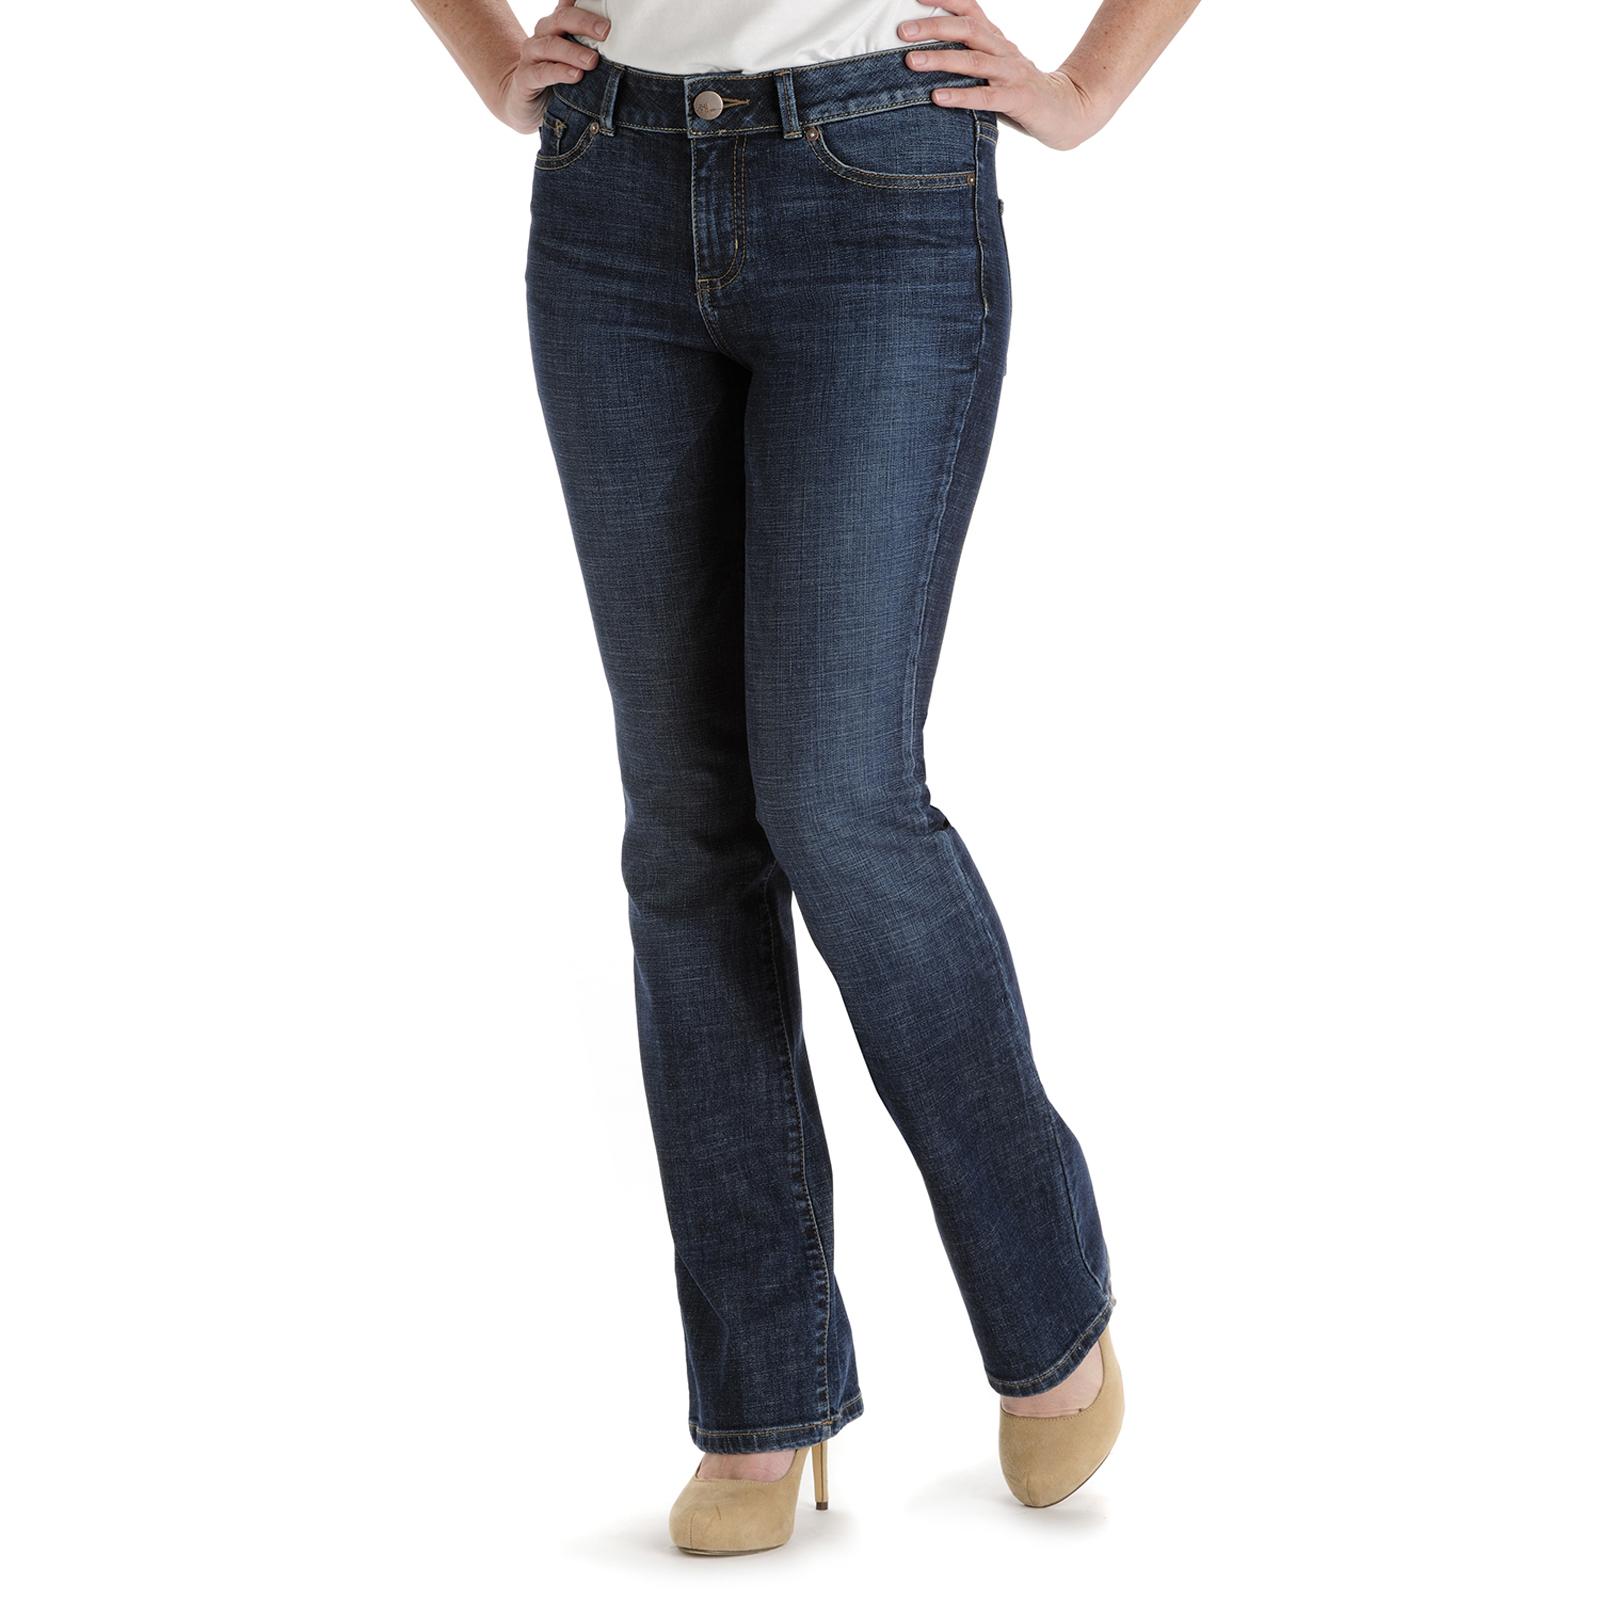 Lee Women' Curvy Fit Bootcut Jeans